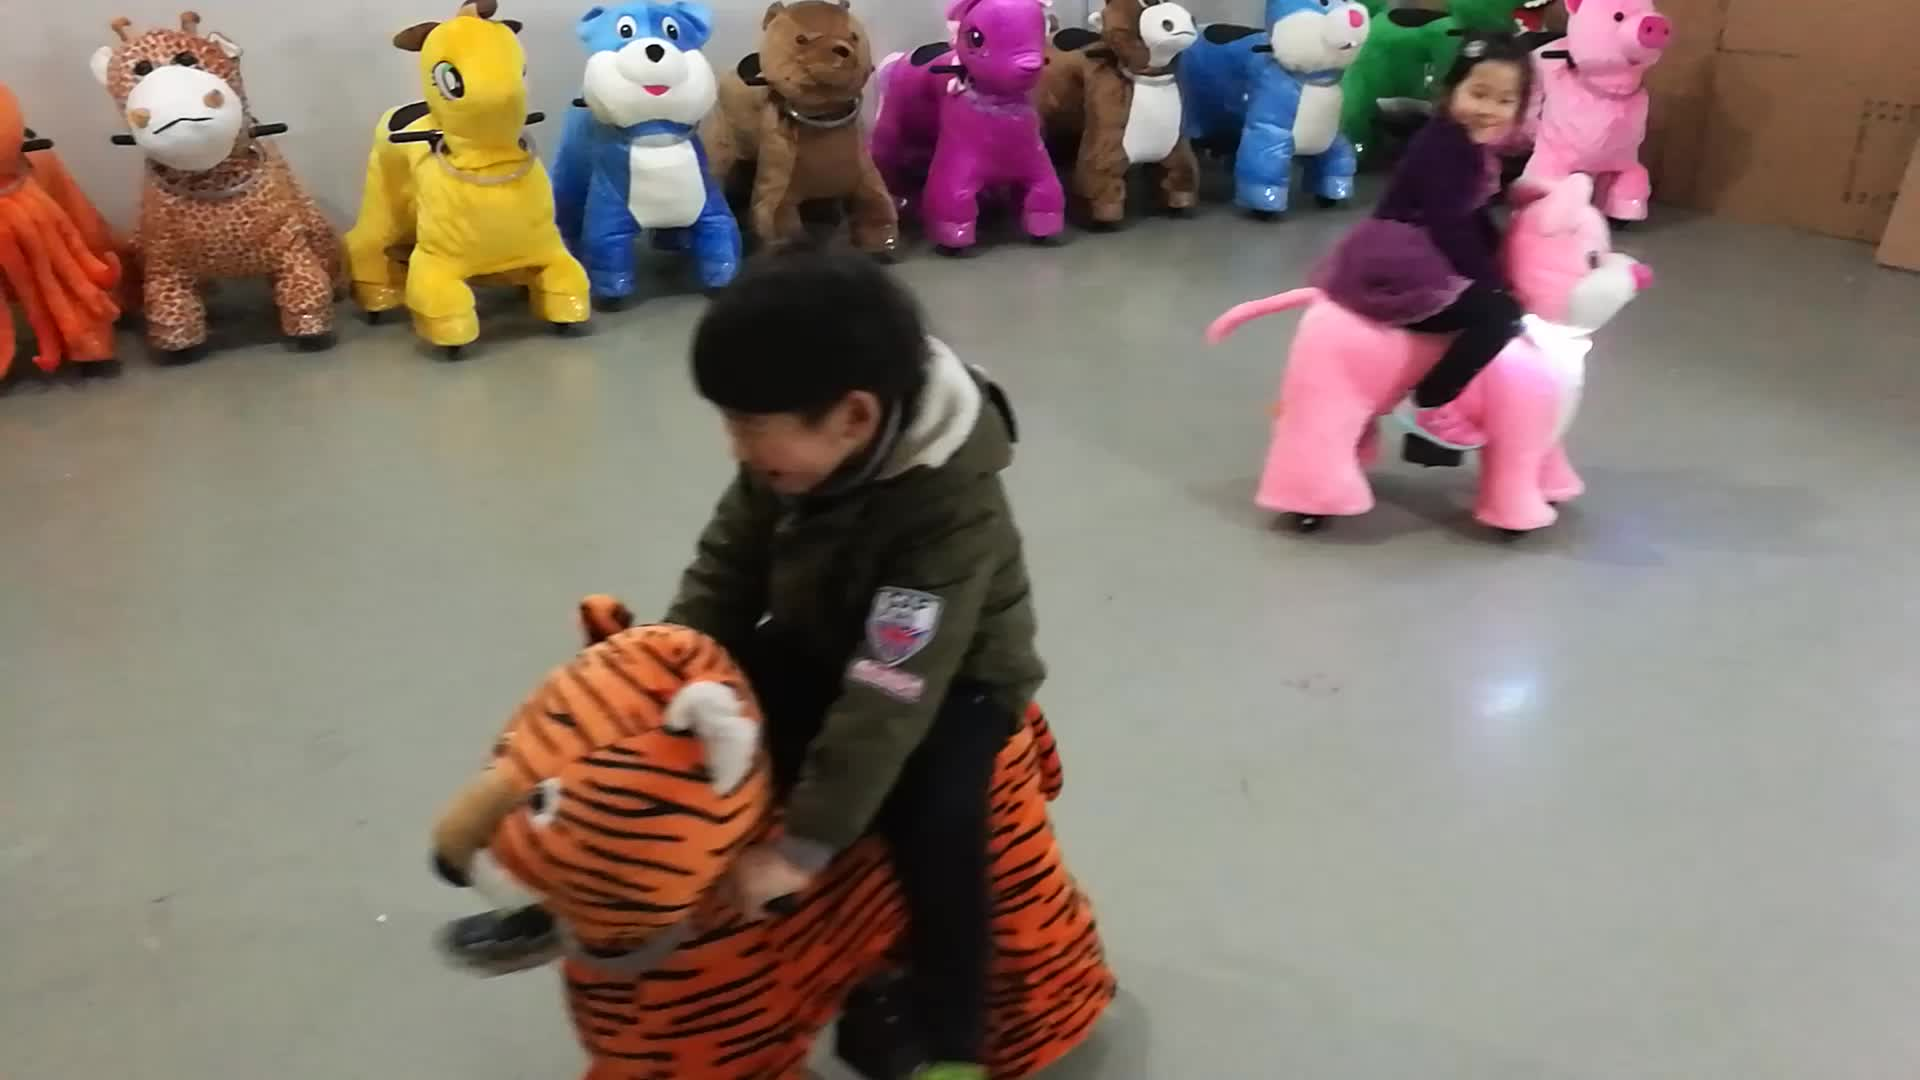 kids dinosaur toy stuffed electric animal ride toy animal ride for children